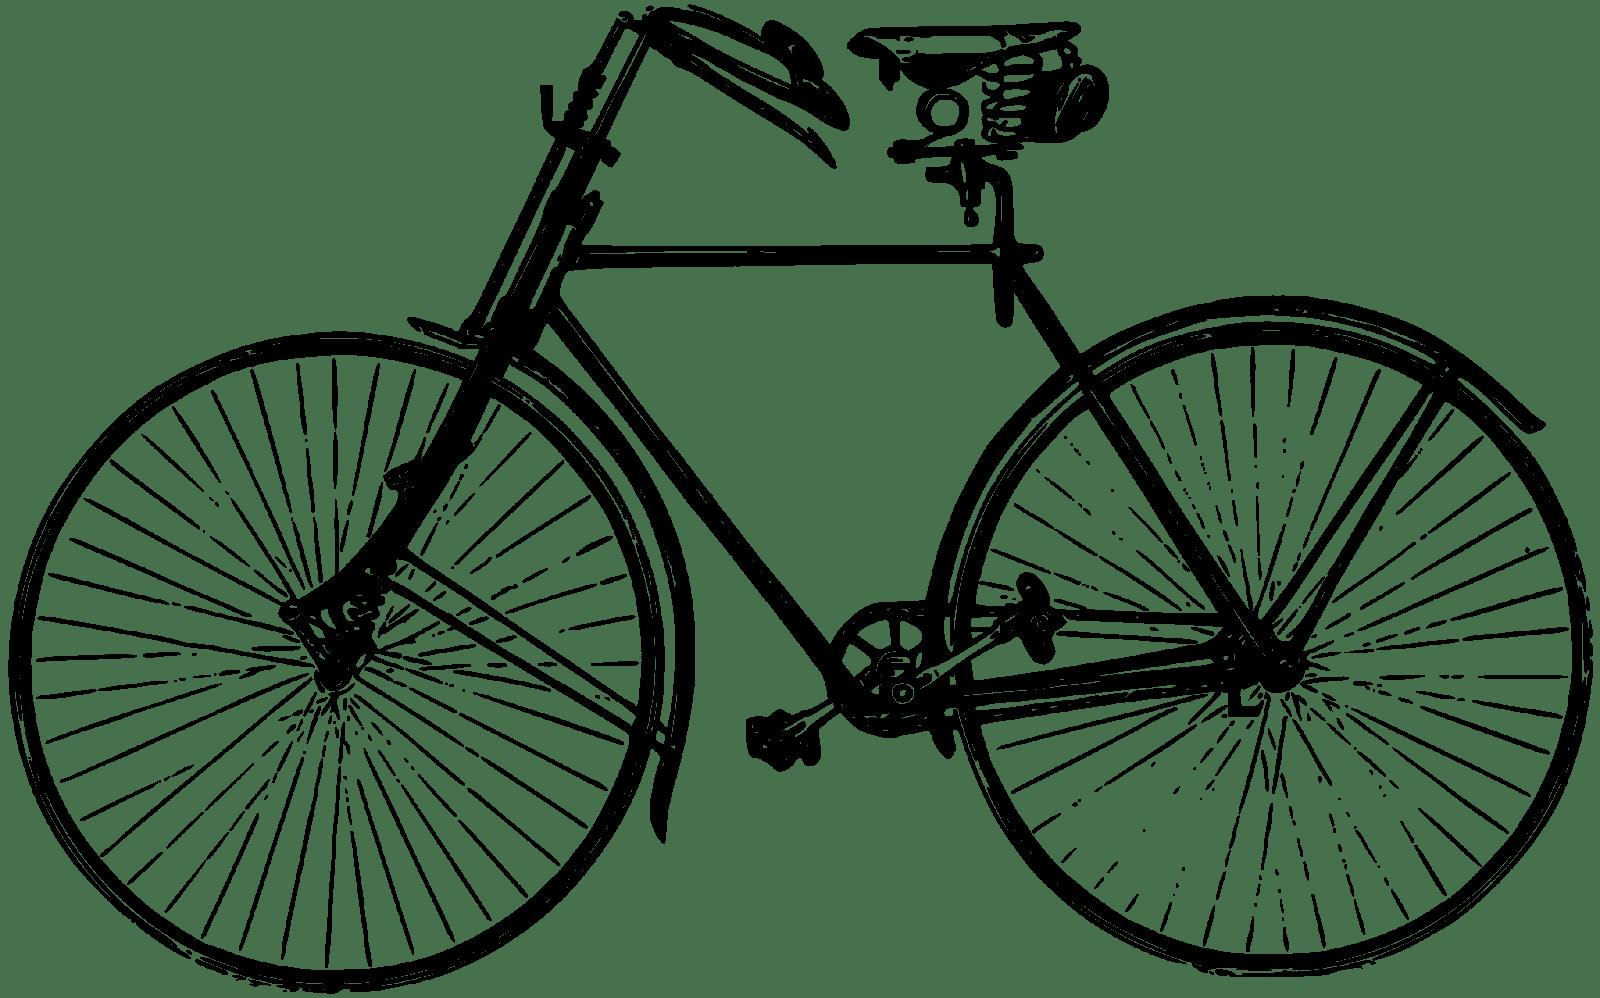 🚲 Bike Clipart Black And White 🚲 - WALLPAPER HD IMAGES for Bicycle Clipart Black And White  177nar